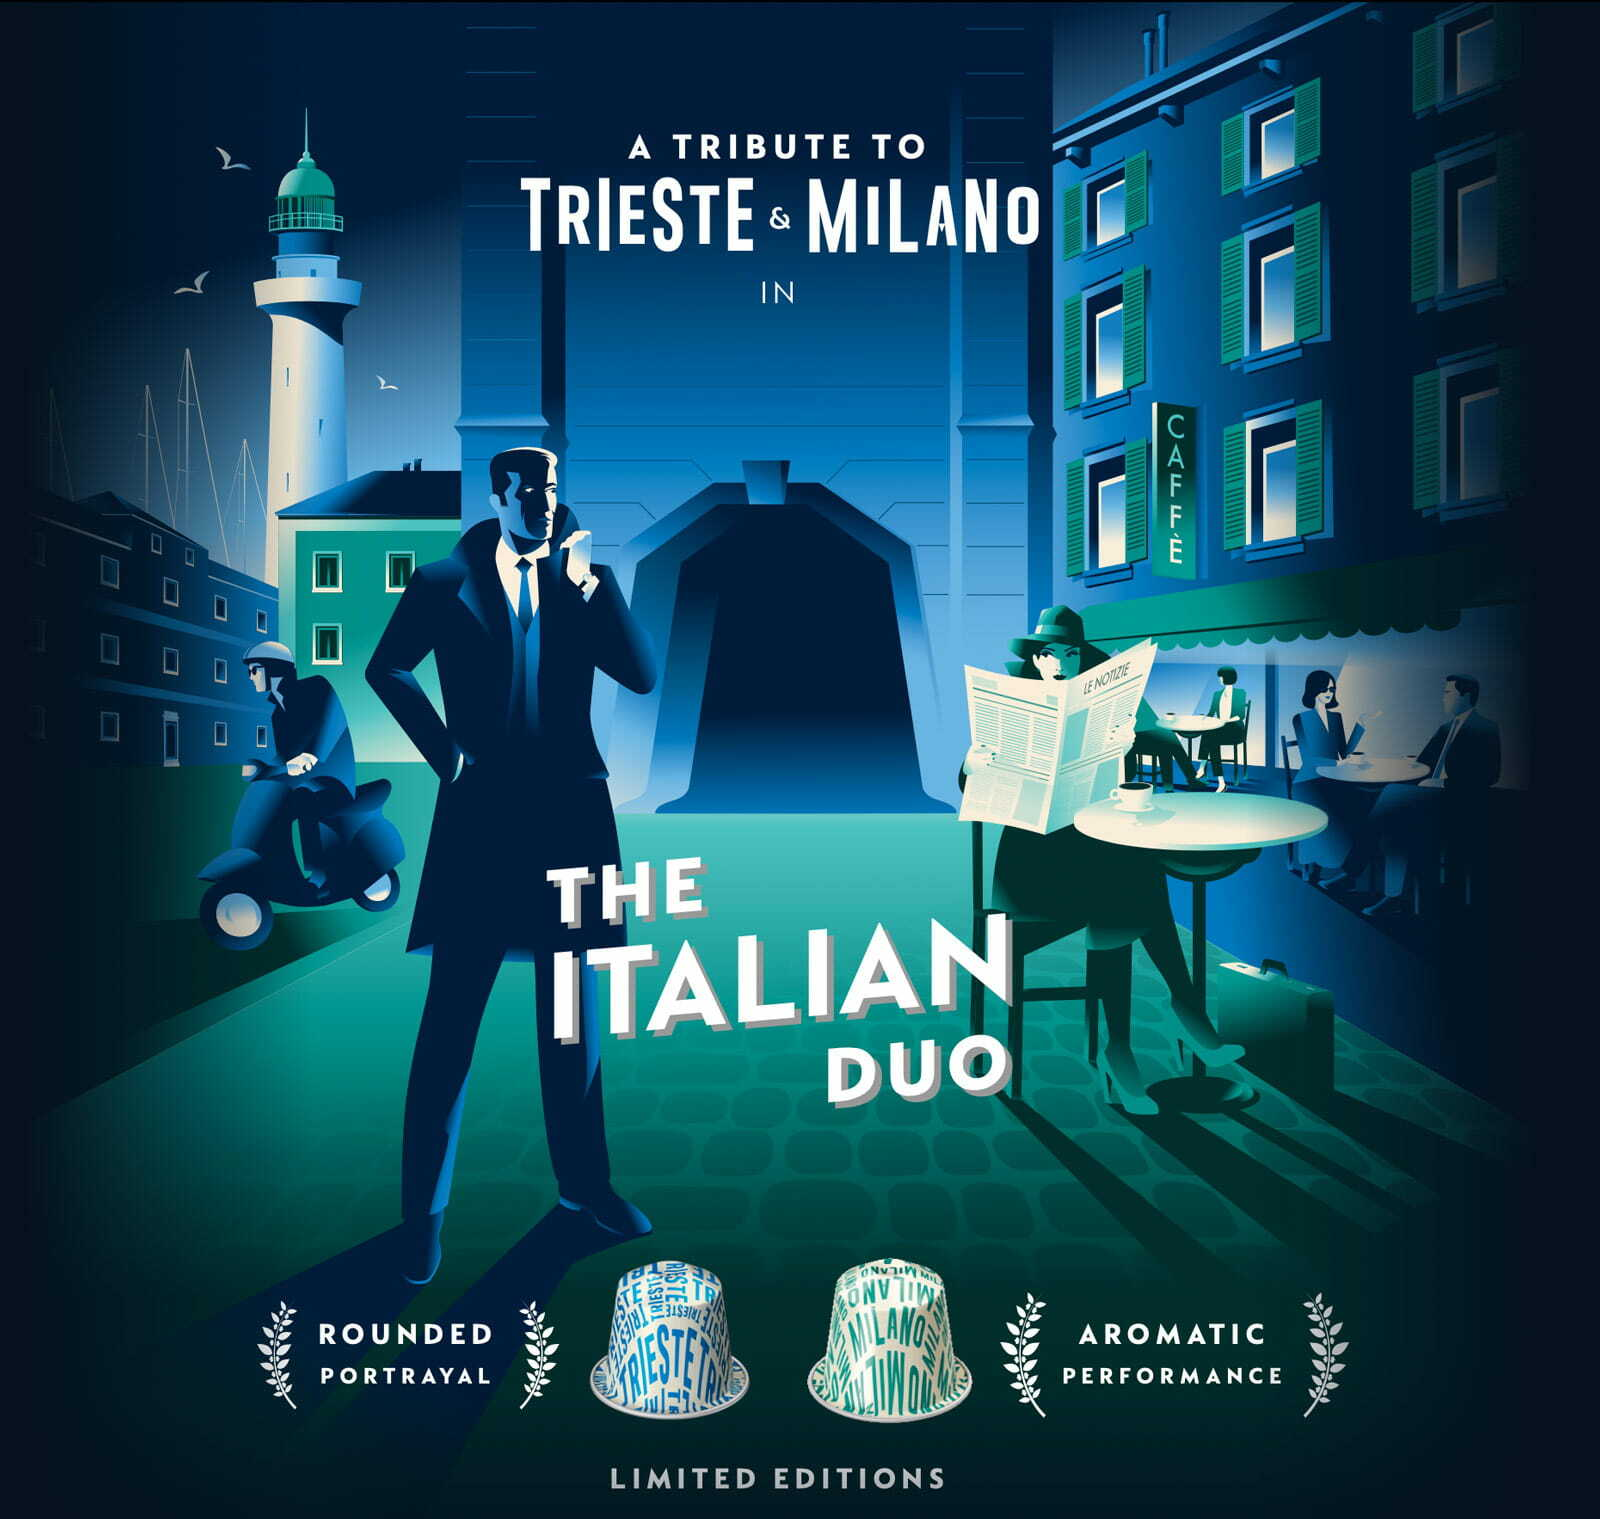 Trieste & Milano